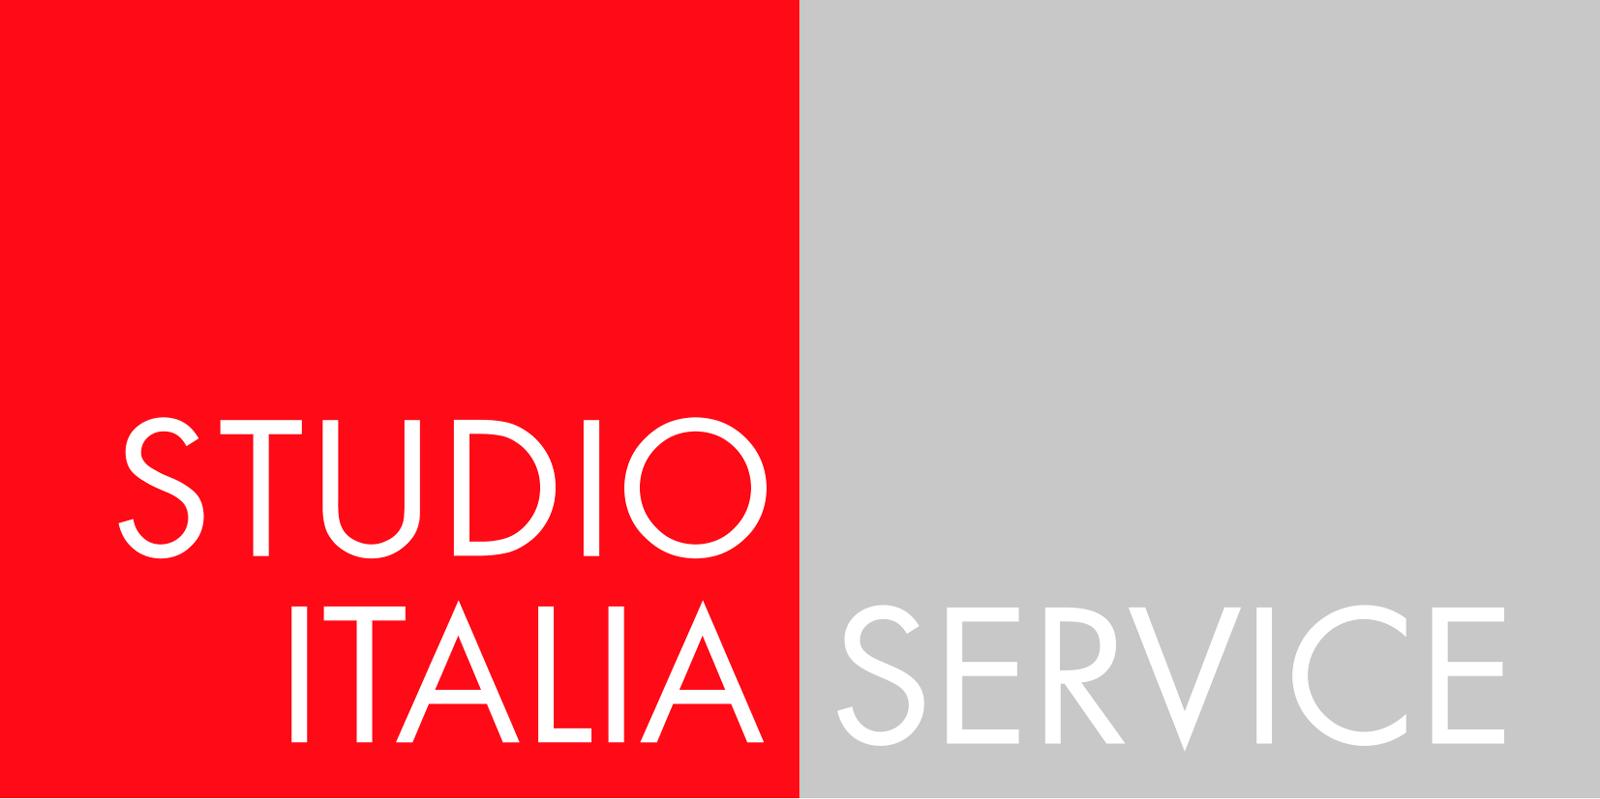 Studio Italia Service